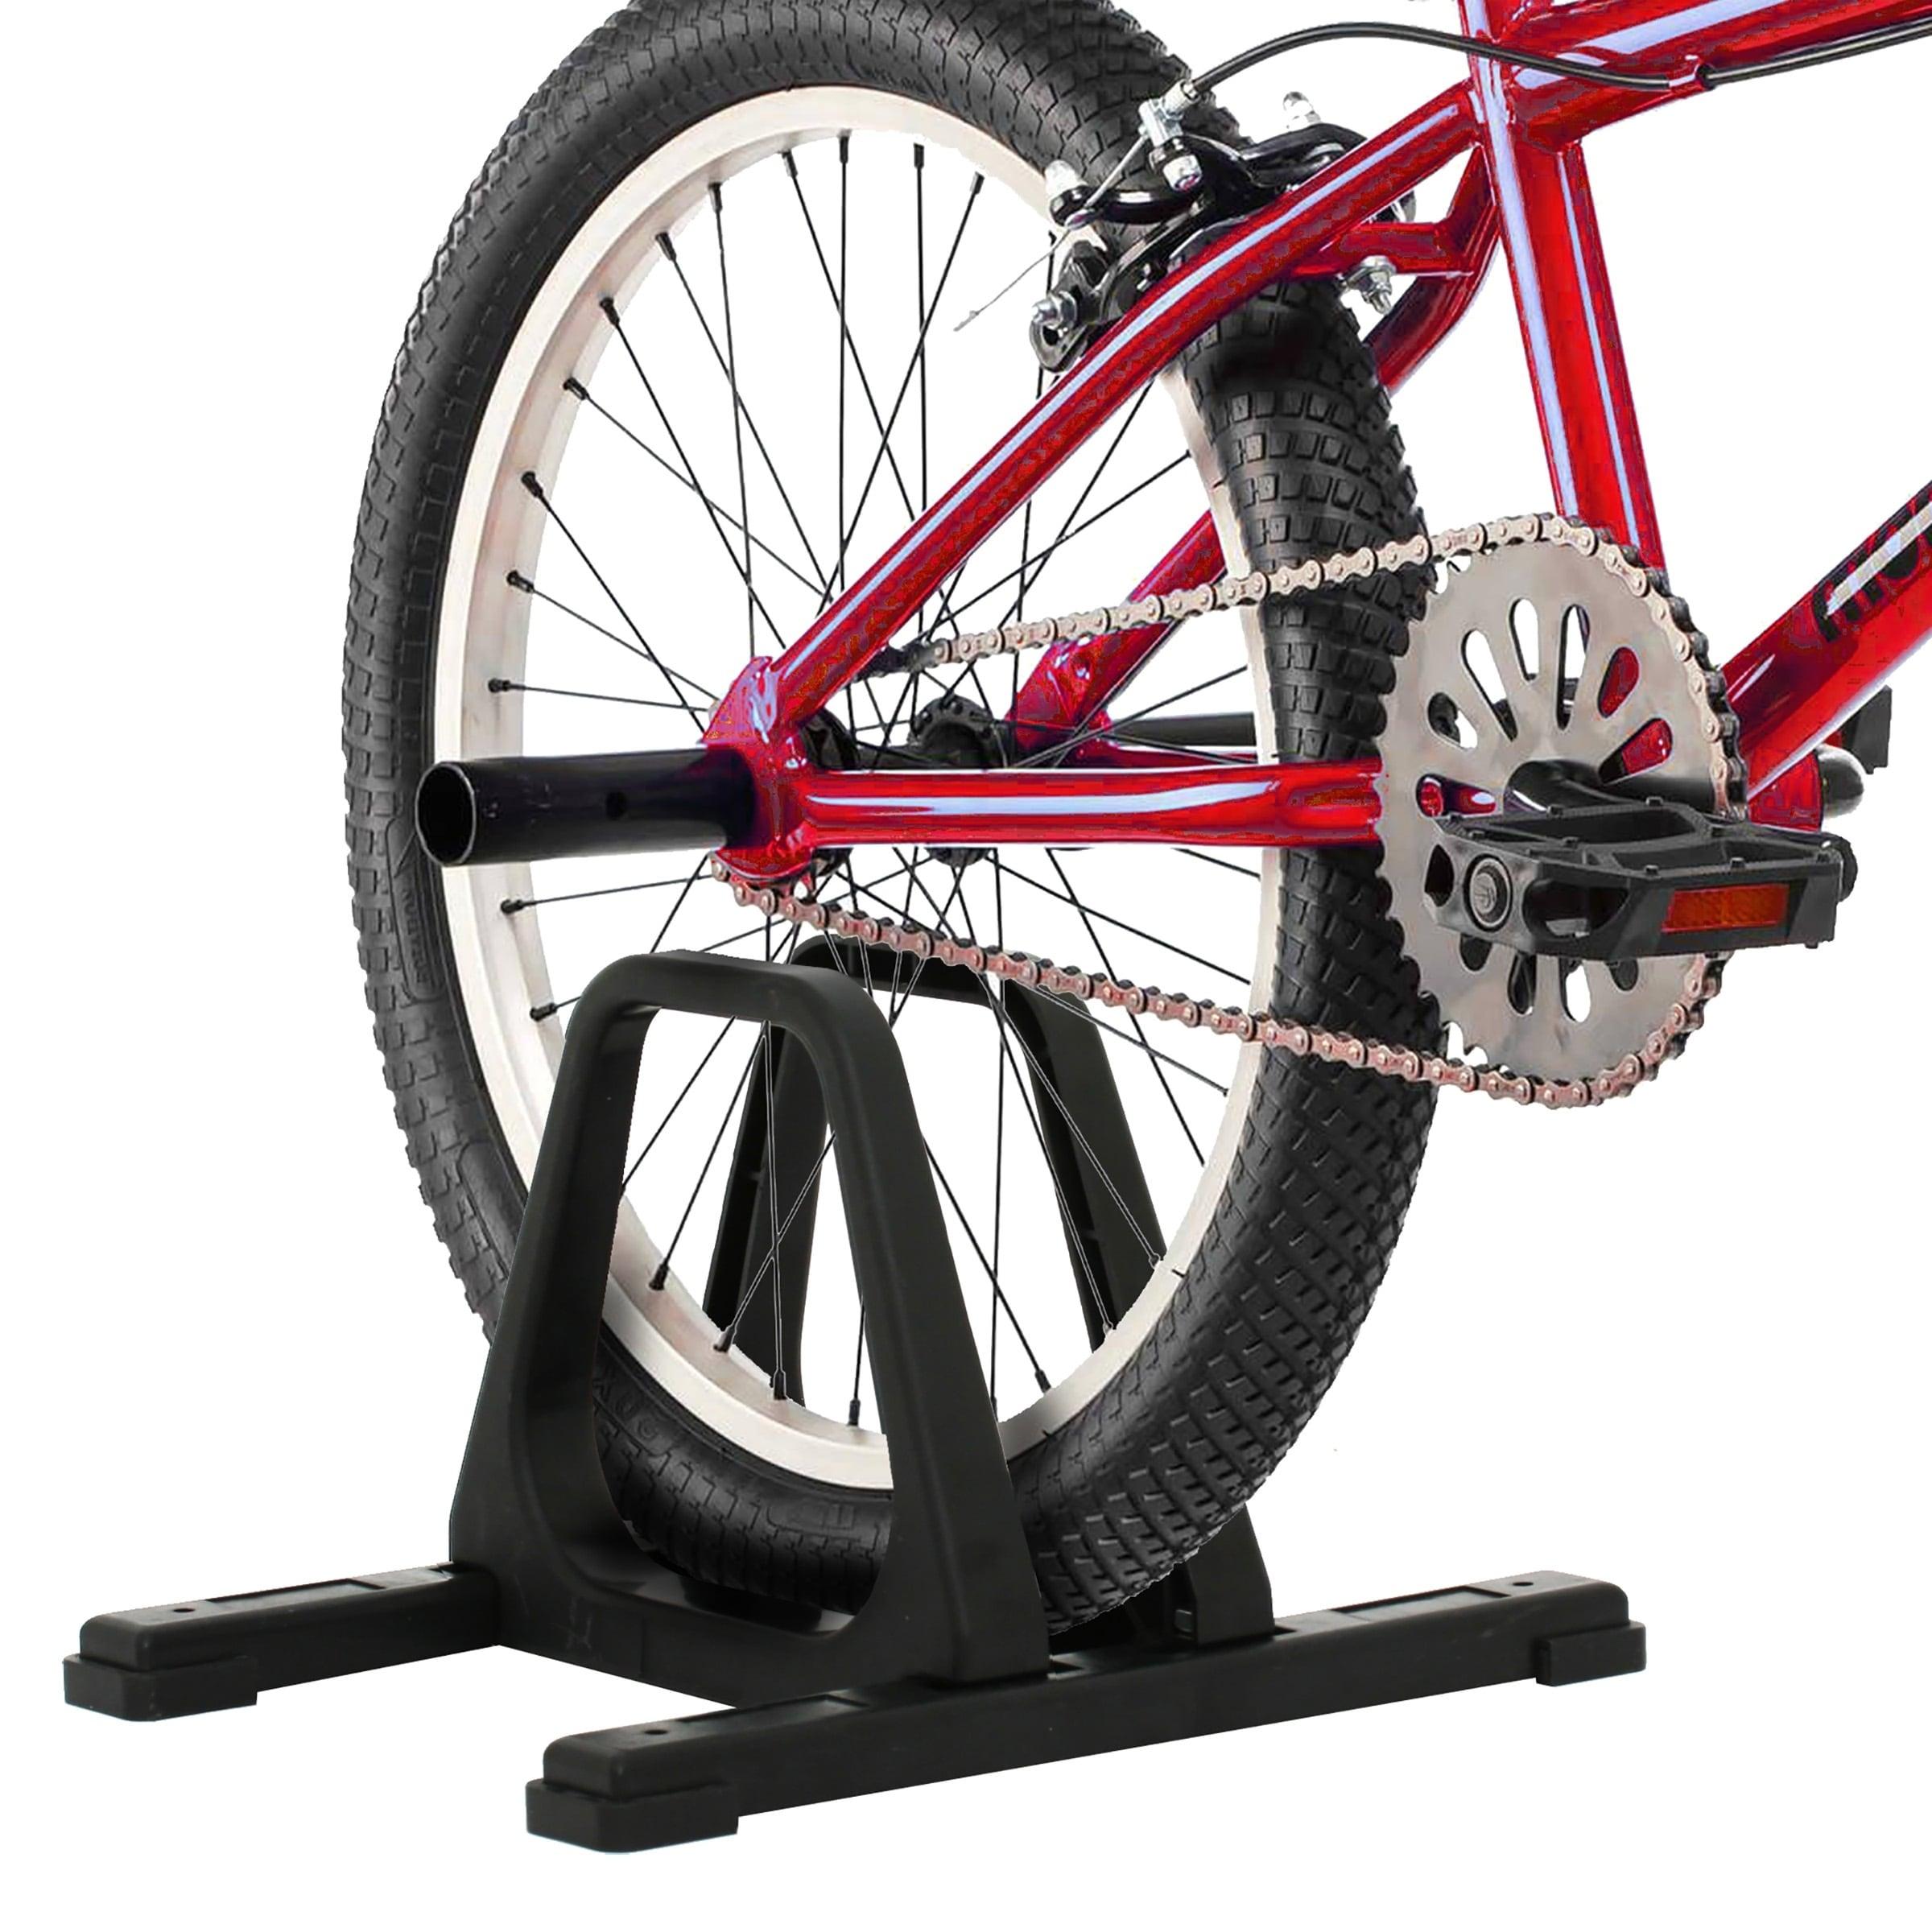 Shop Rad Cycle Bike Stand Portable Floor Rack Bicycle On Sale